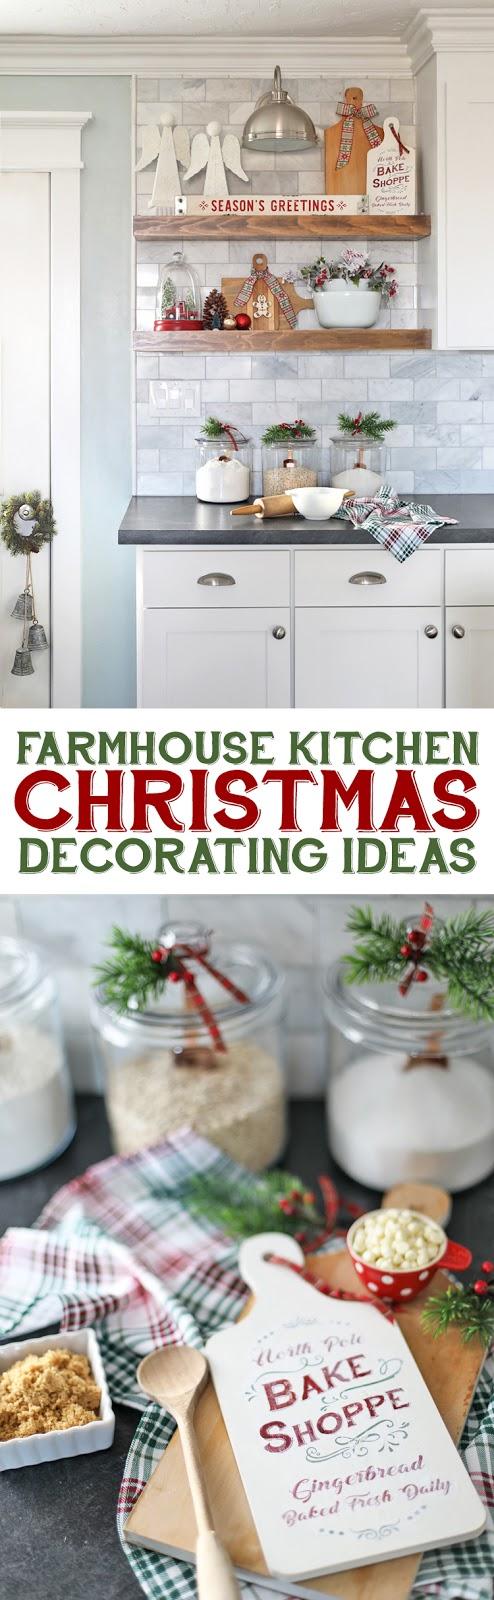 Farmhouse Kitchen Decorating Ideas. How to decorate open shelves for the holidays. #Christmasdecor #handmadewithjoann